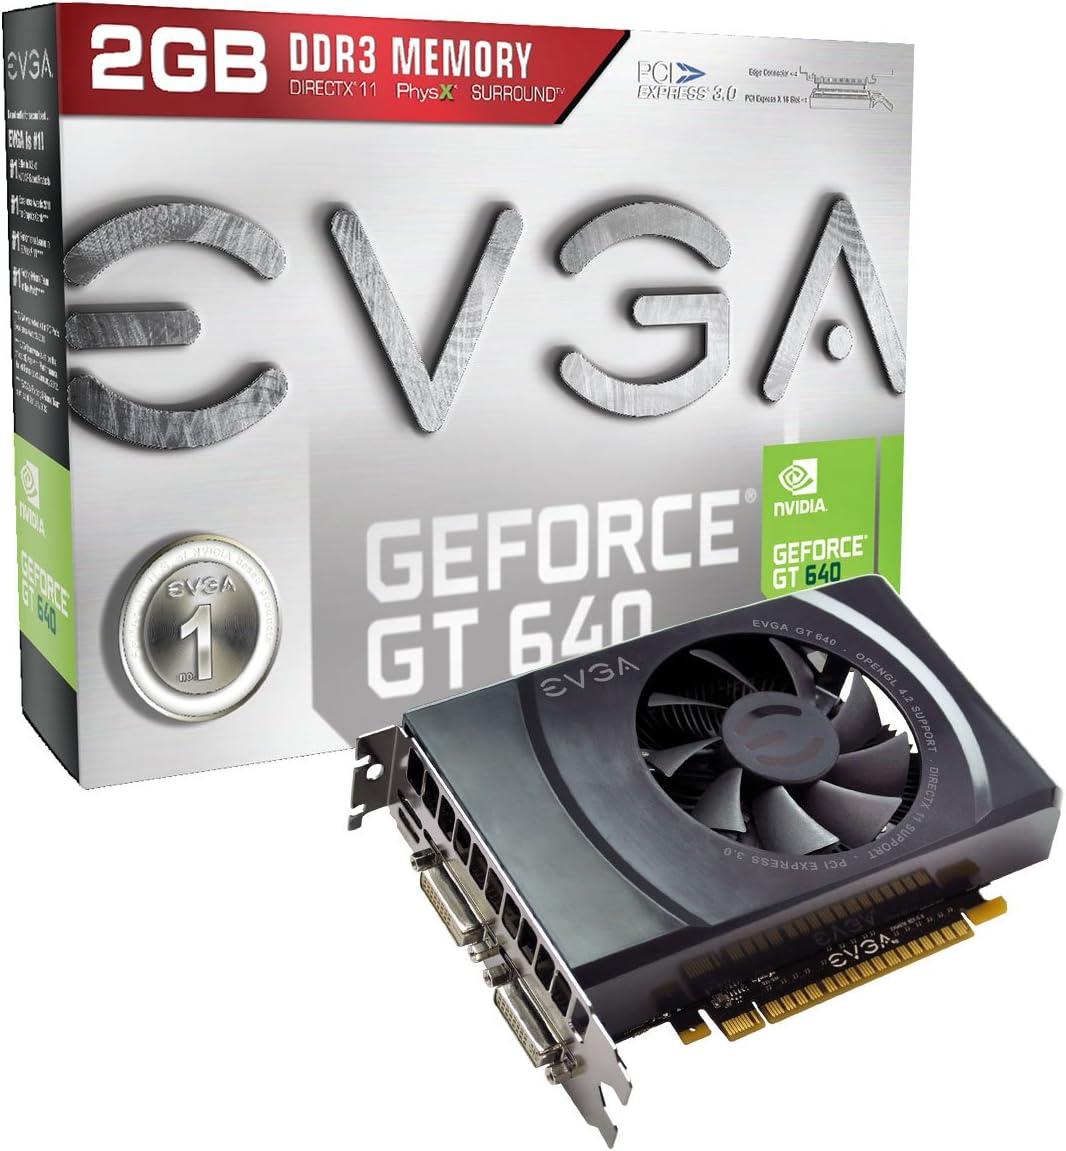 EVGA GeForce GT 640 2048MB GDDR3 Dual DVI, mHDMI Graphics Cards 02G-P4-2643-KR